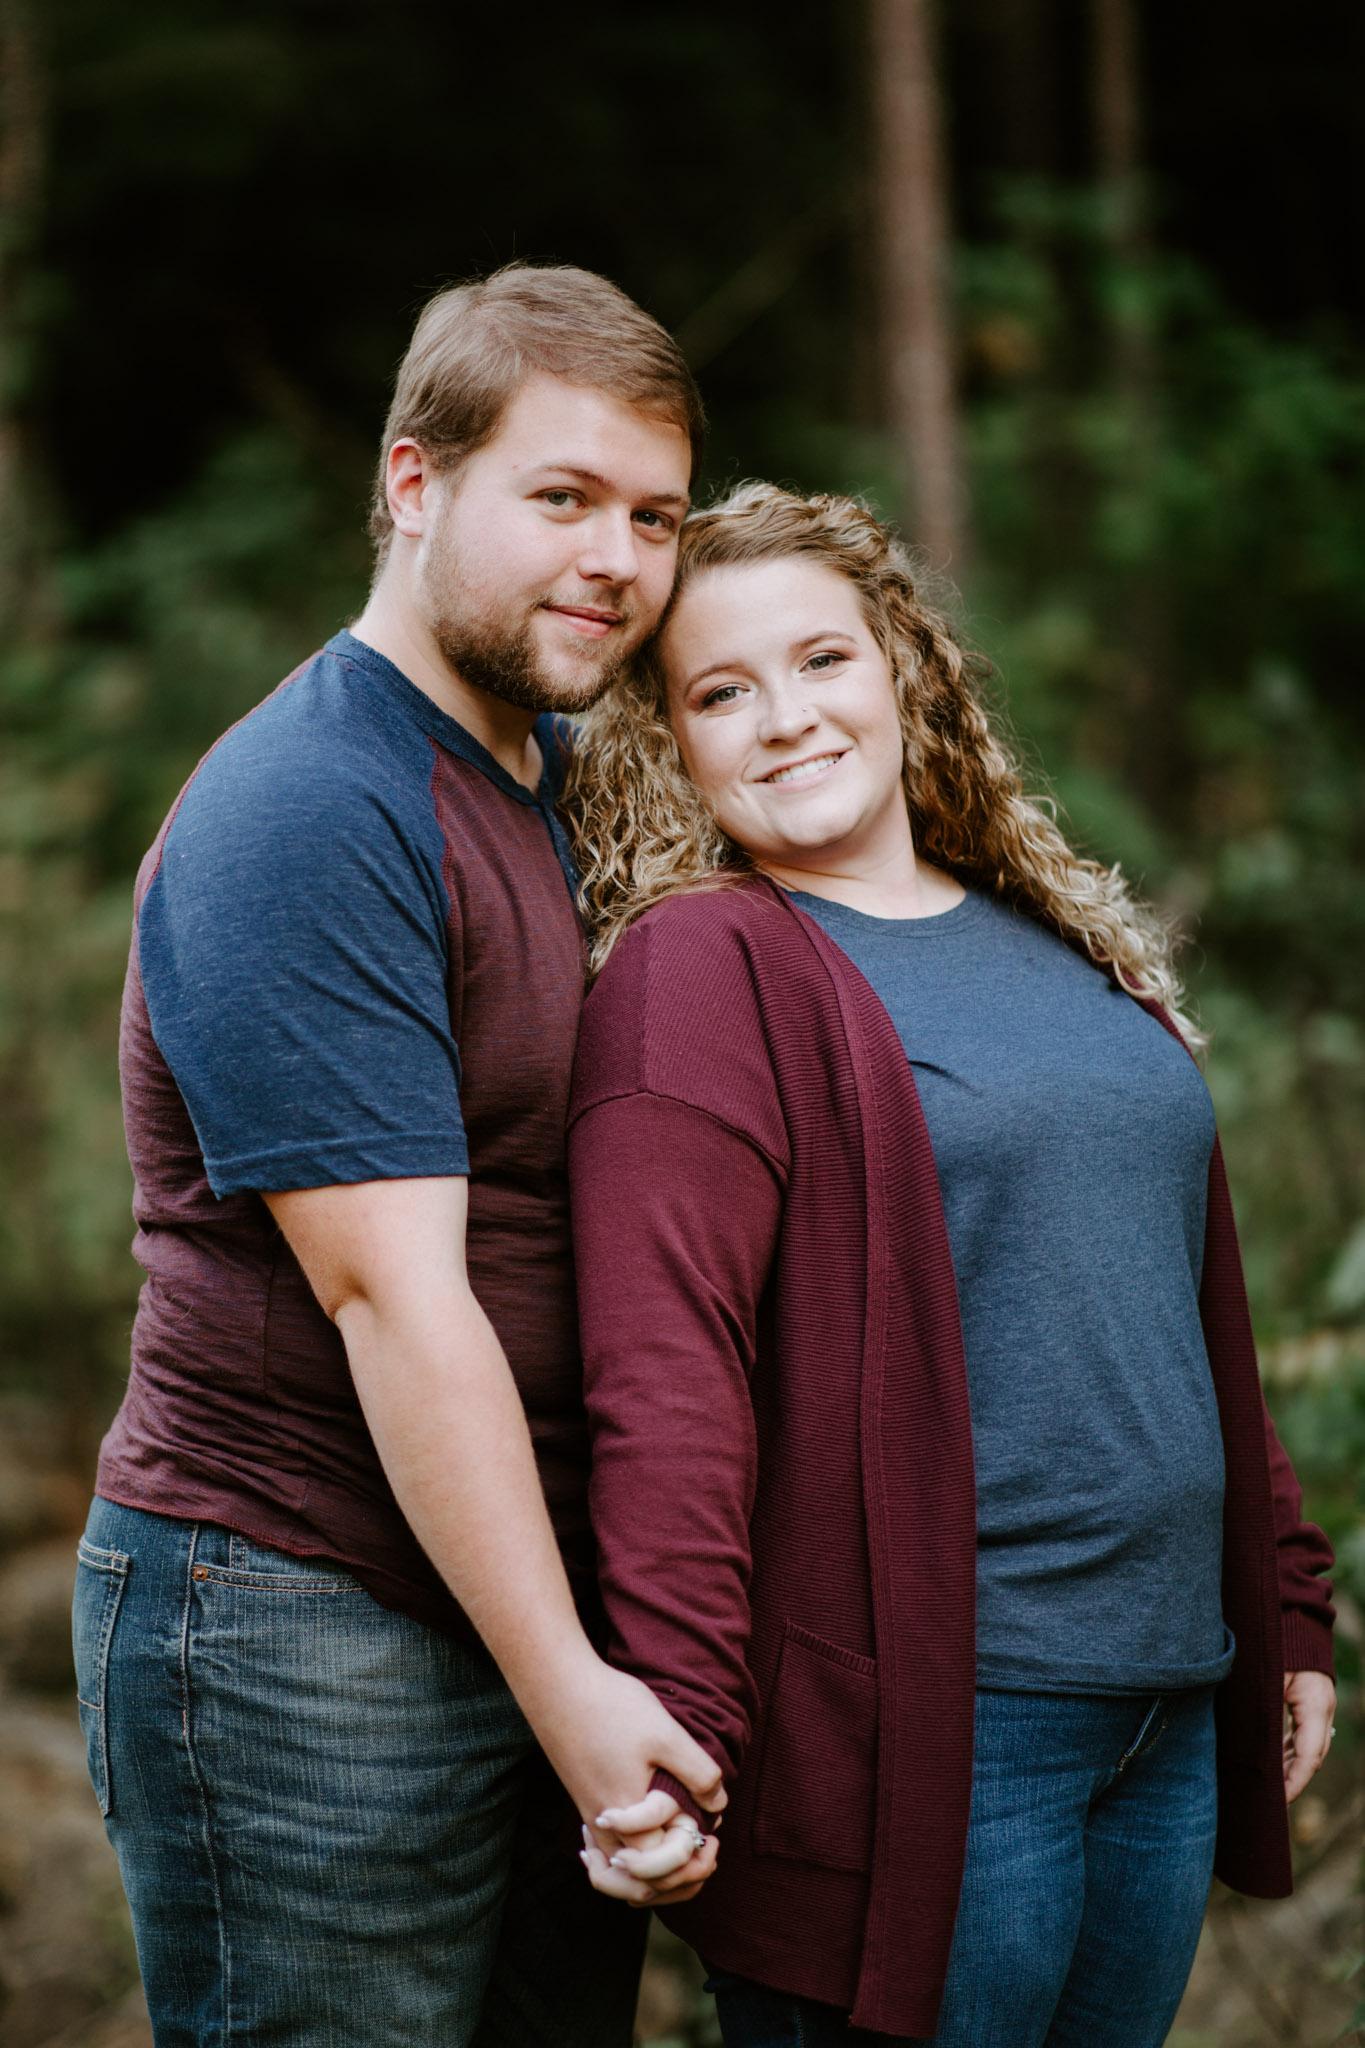 Kaitlin + Blake + Chattanooga + Tennessee + Engagement + Ocoee River + Wedding + Photographer-55.jpg